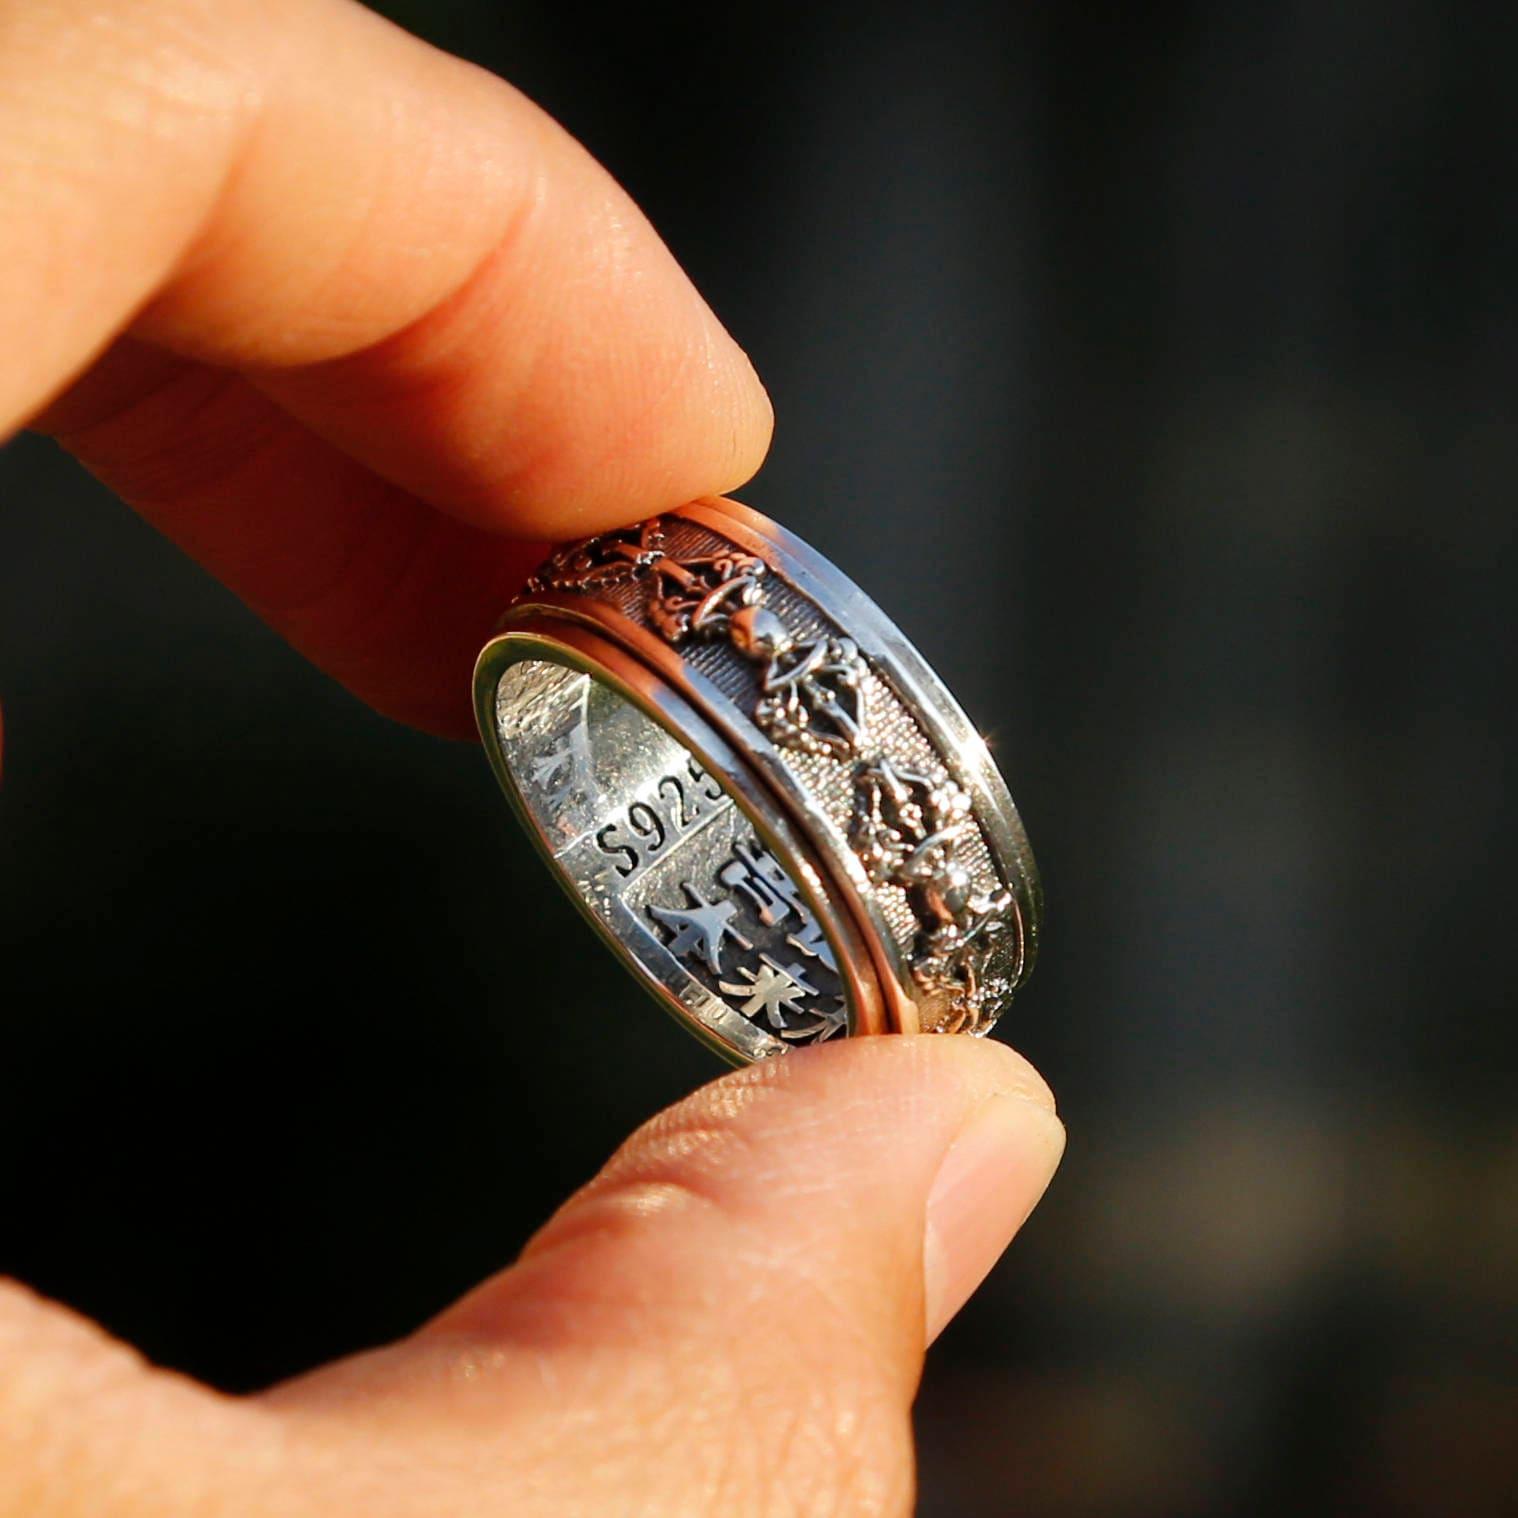 Embossed Tibetan Buddhist Vajra Sterling Silver Spinner Ring, Meditation Mens Ring, Buddhist Prayer Symbol Om Ring, Chinese Man Ring, Nepal